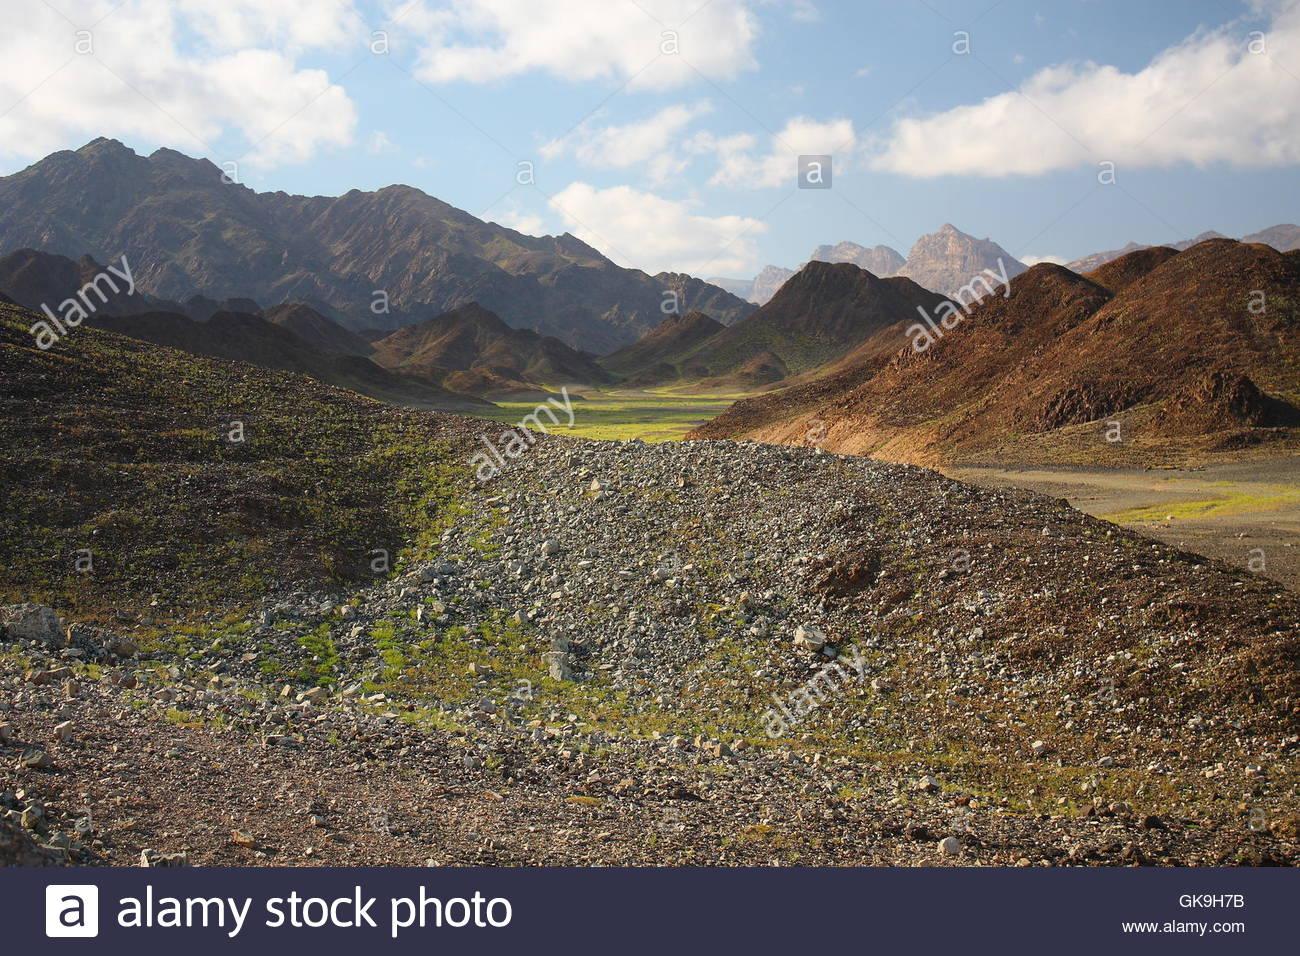 mountains rock yemen - Stock Image